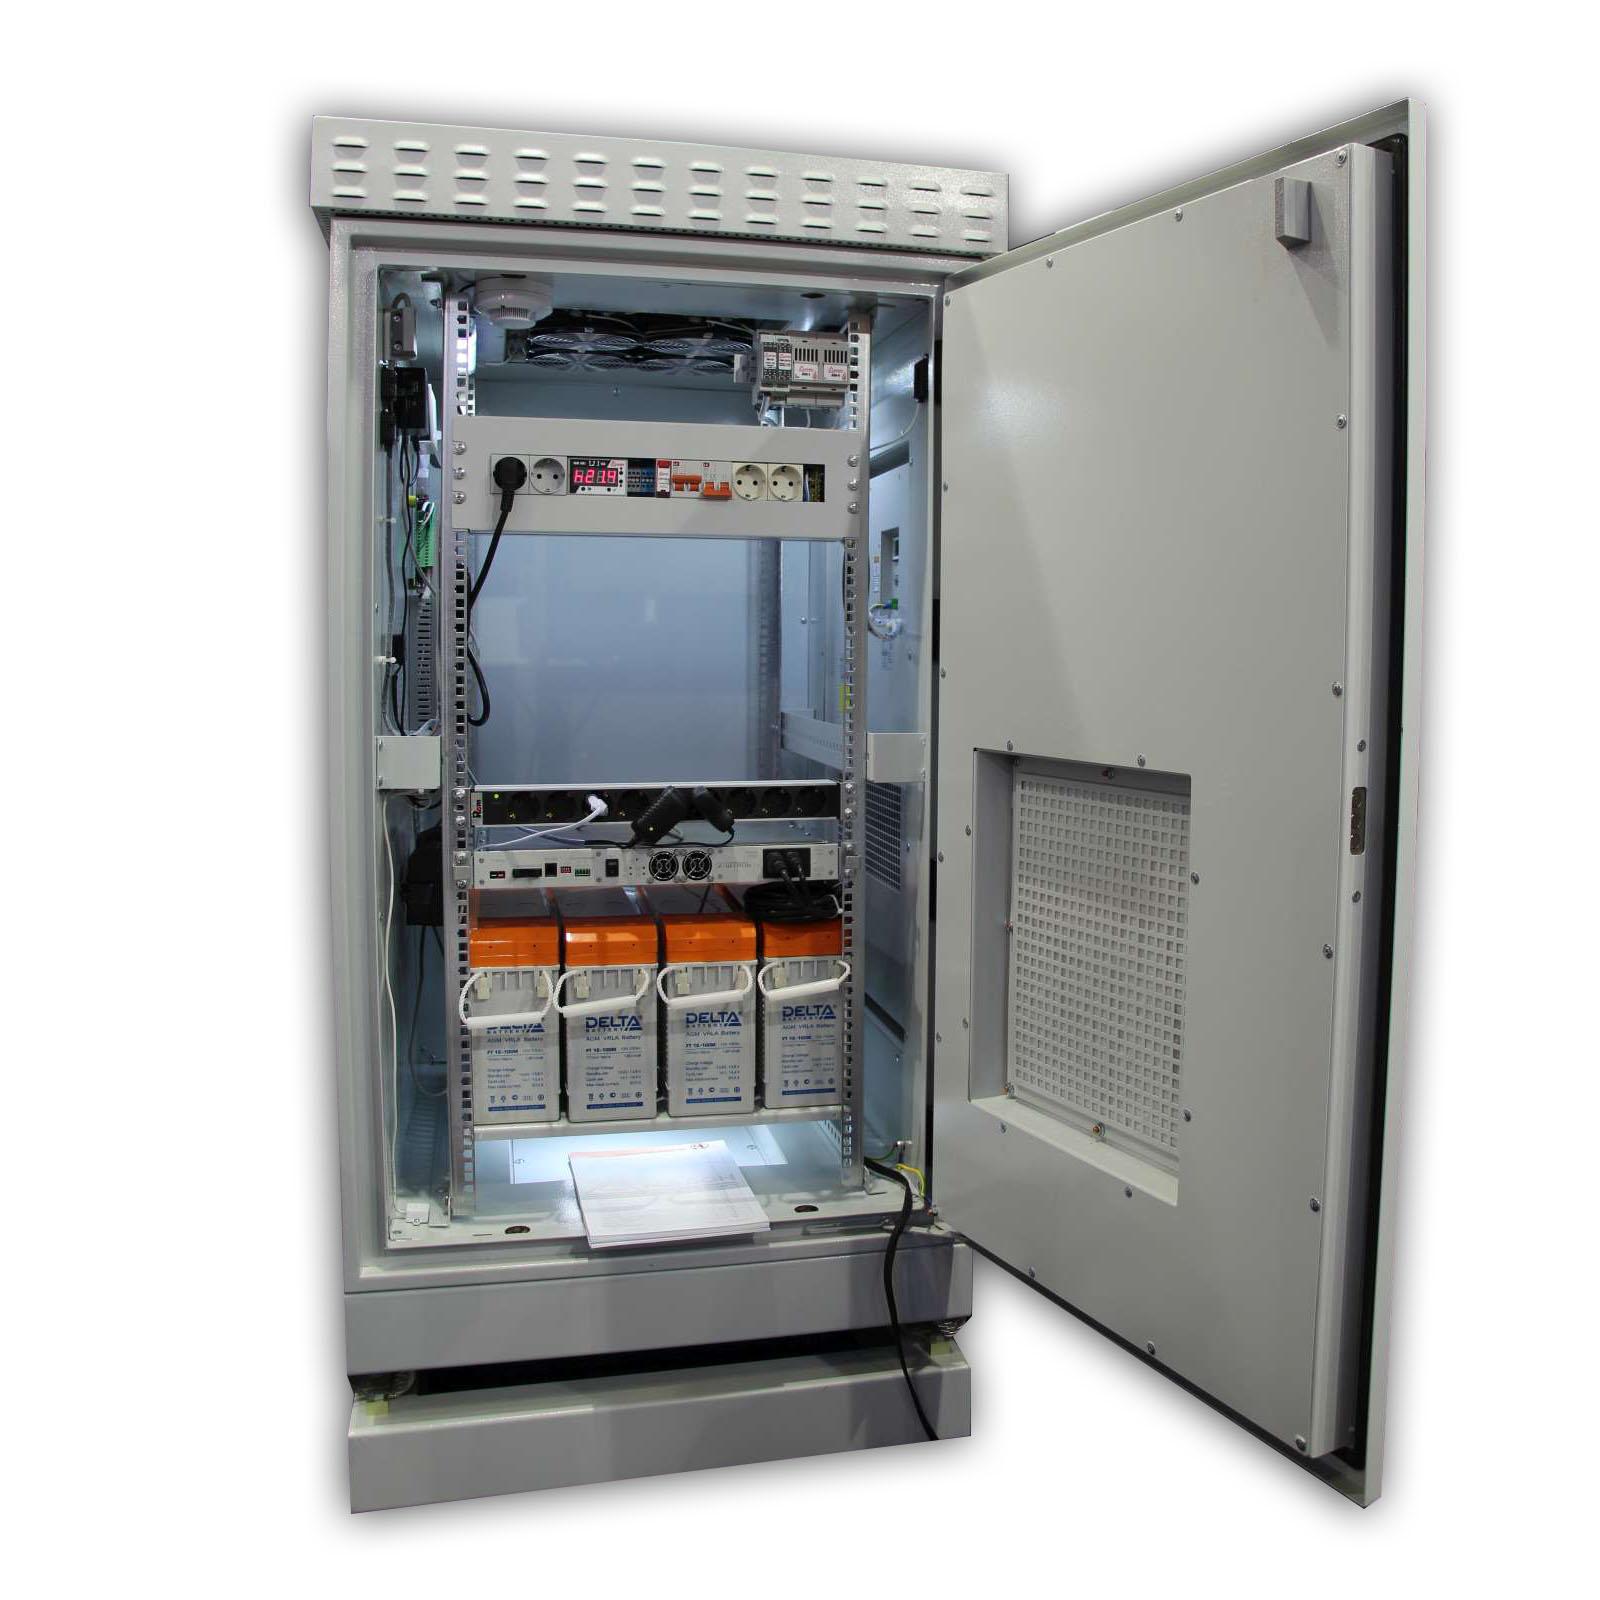 Термошкаф «Амадон» антивандальный, двустенный, 750х1200х800, с ИБП, виброгасителями и удаленным мониторингом на базе Uniping v3